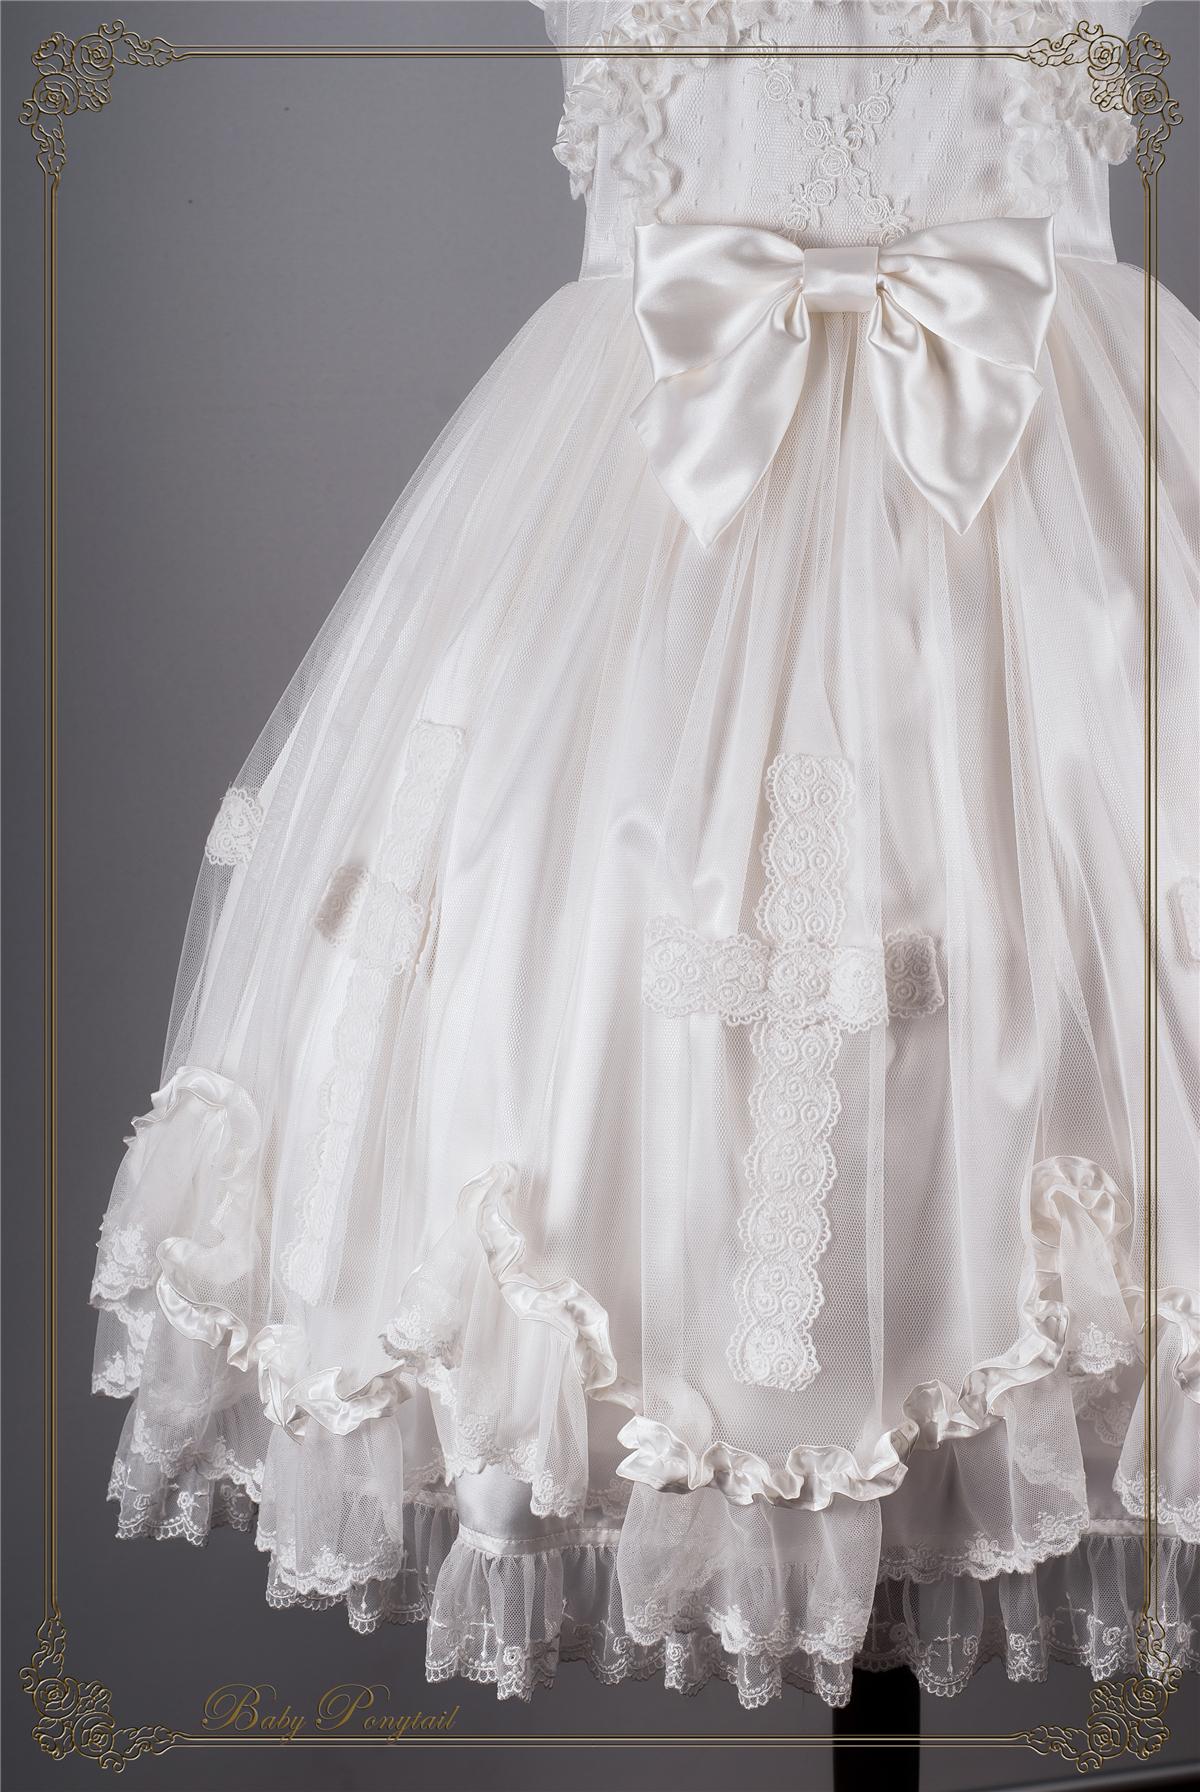 Babyponytail_Heavenly Teardrops_JSK White Stock Photo_12.jpg